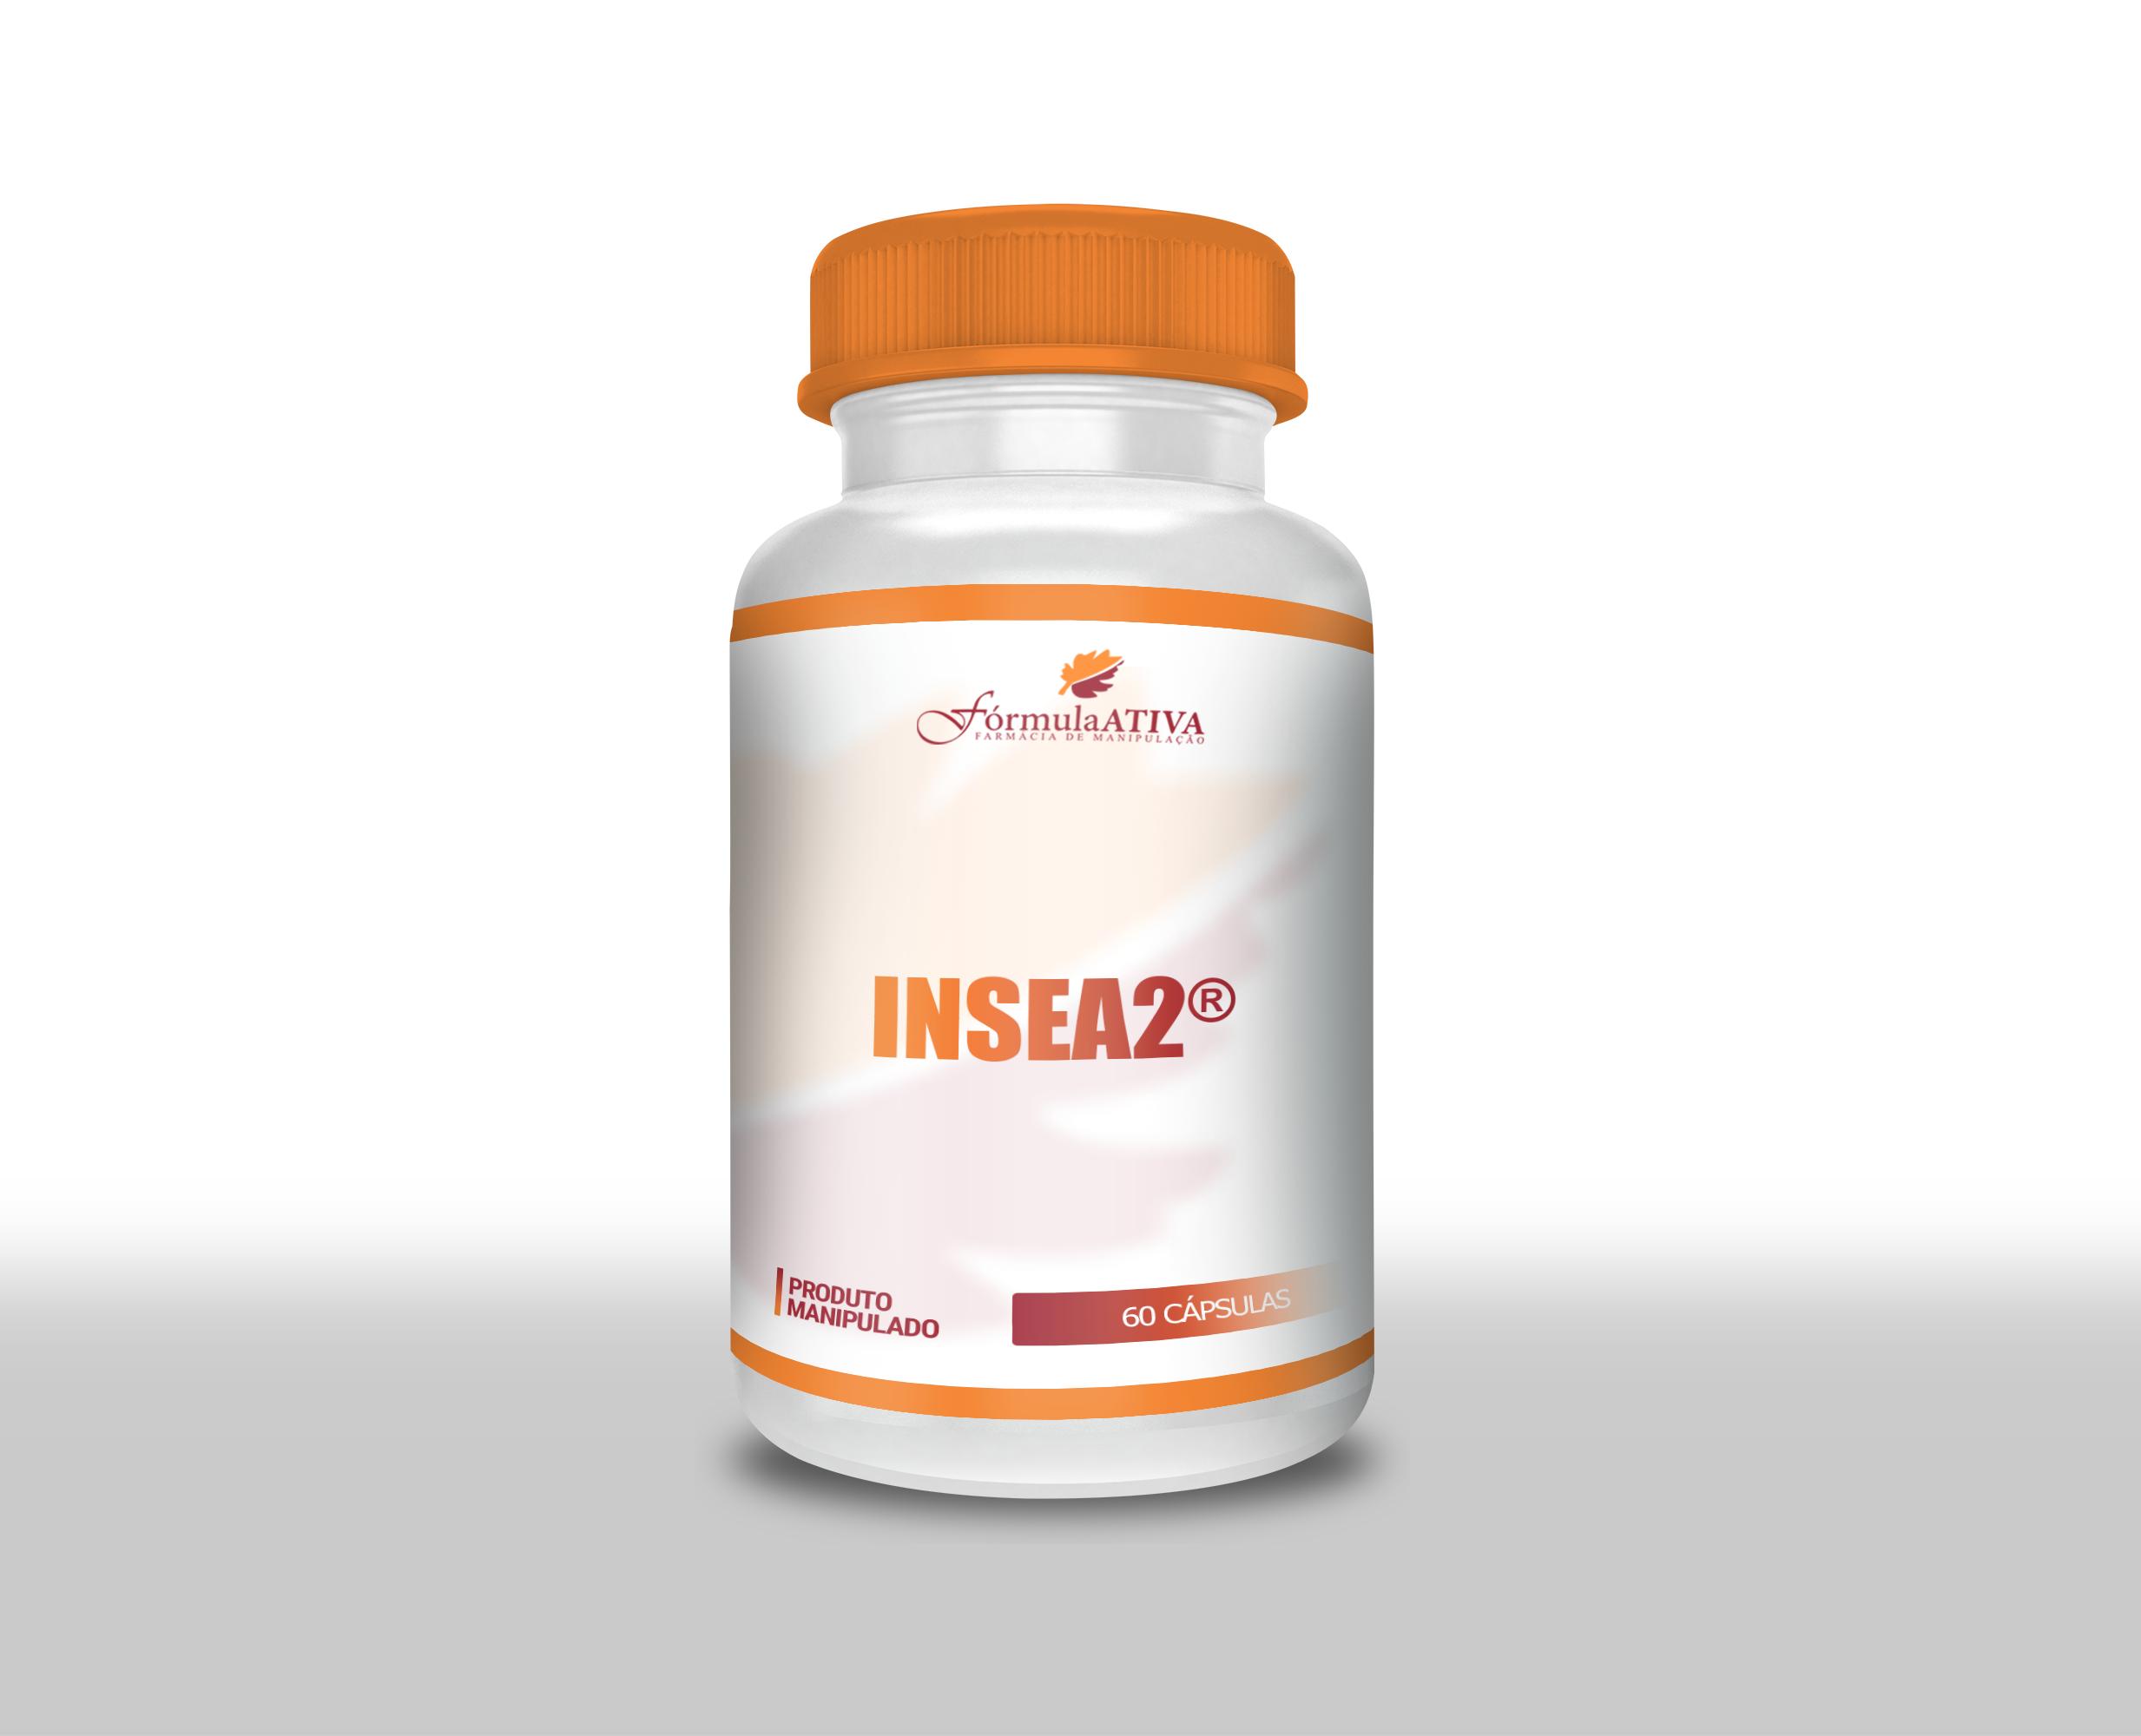 InSea 2 (250mg - 60 doses)